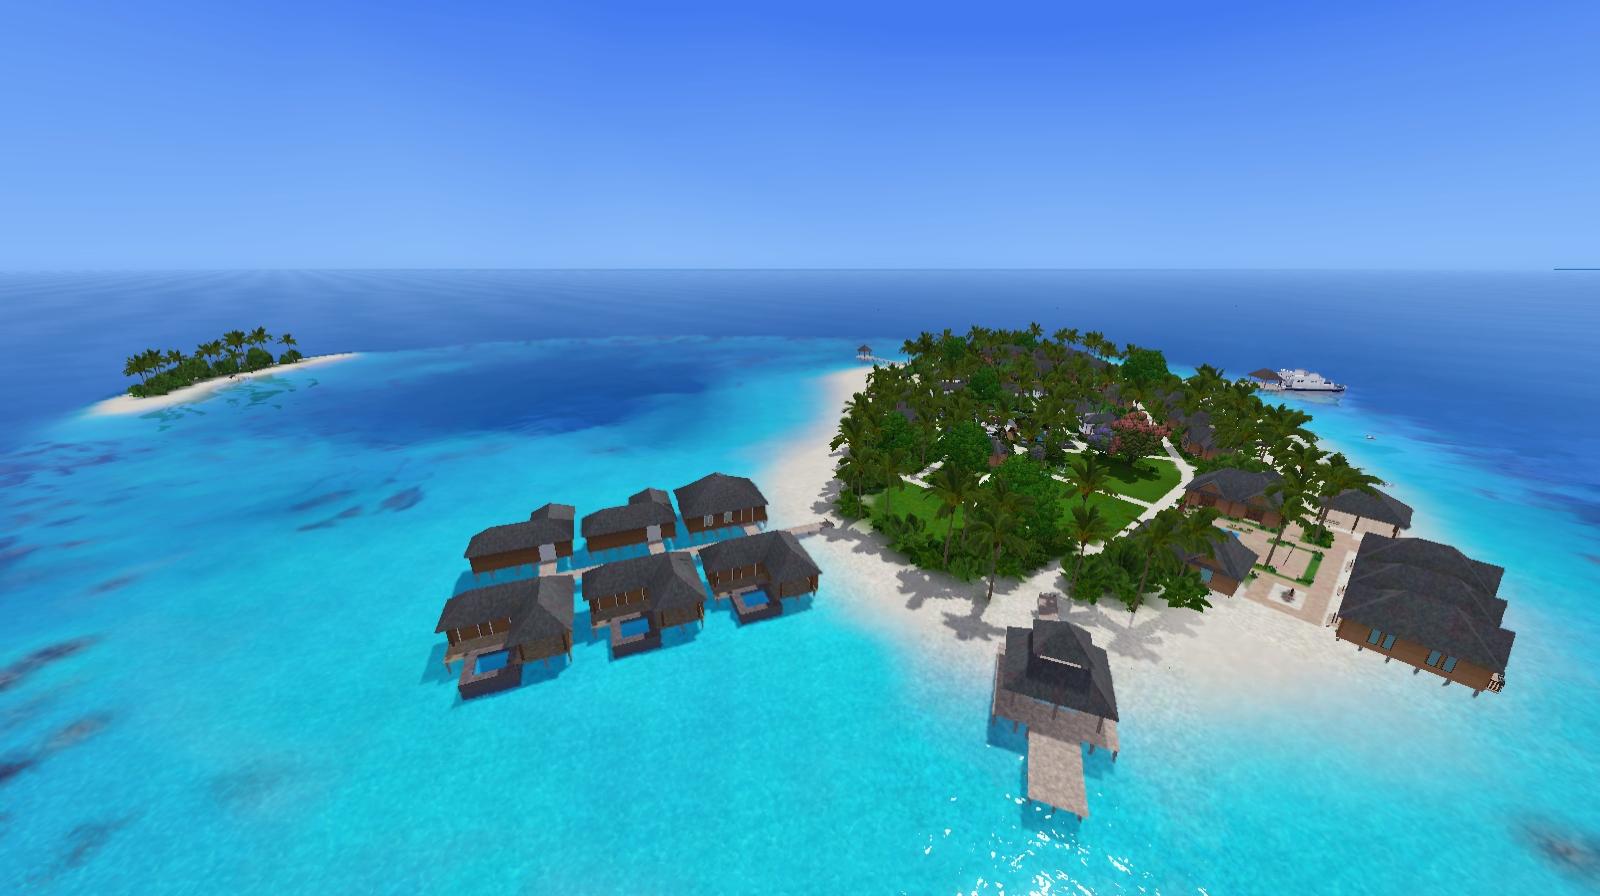 [Descarga] Mundo Suvadiva Resort, poblado. Screenshot-487